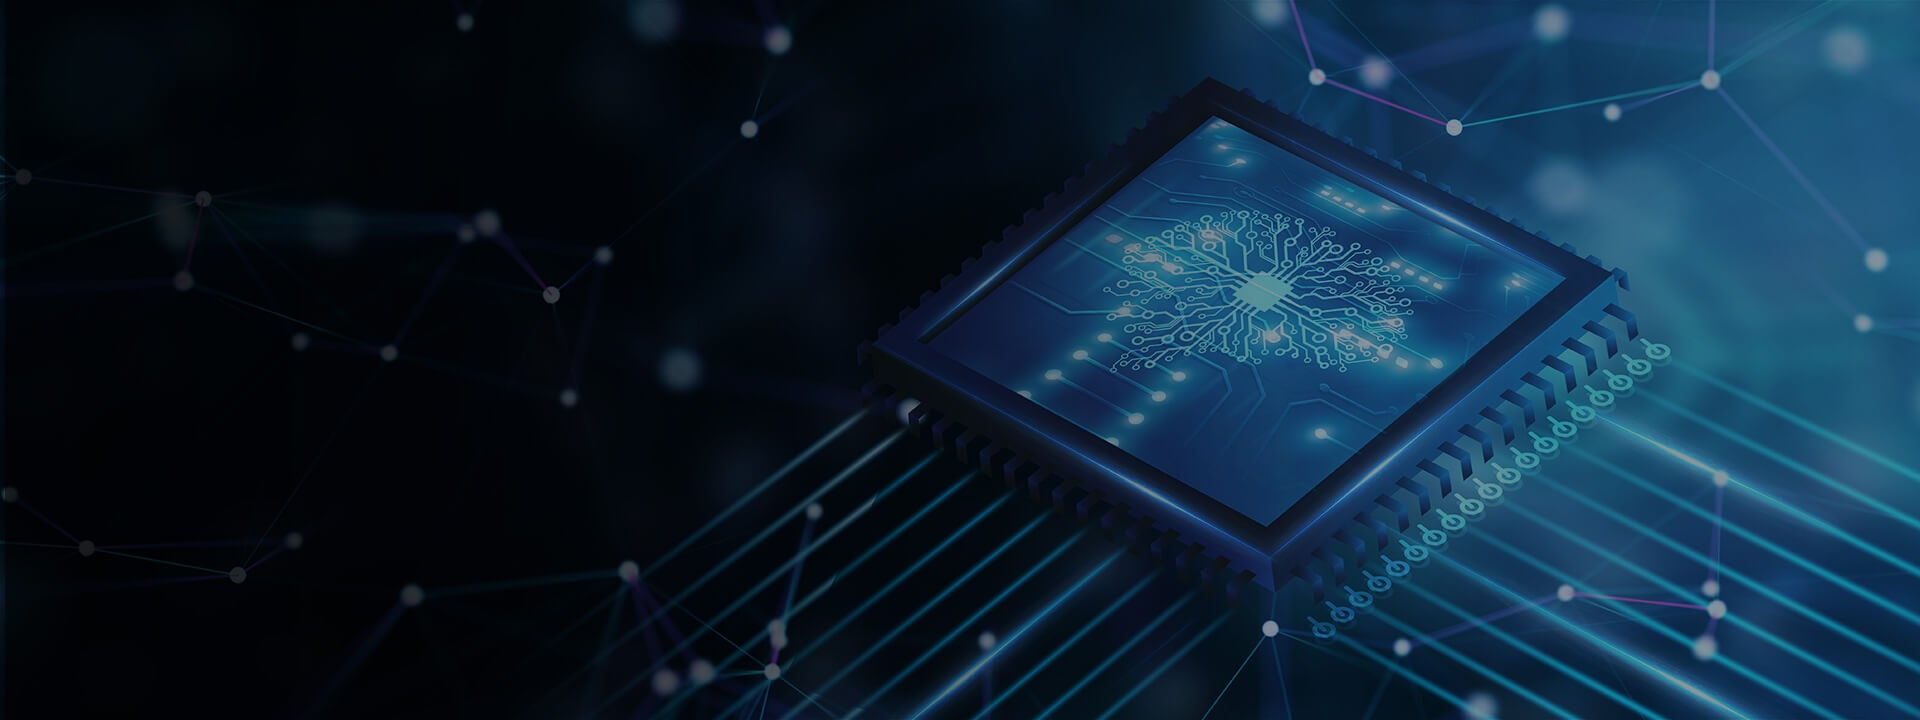 DataRobot The Intelligence Revolution Needs More AI Heroes BG v.1.0